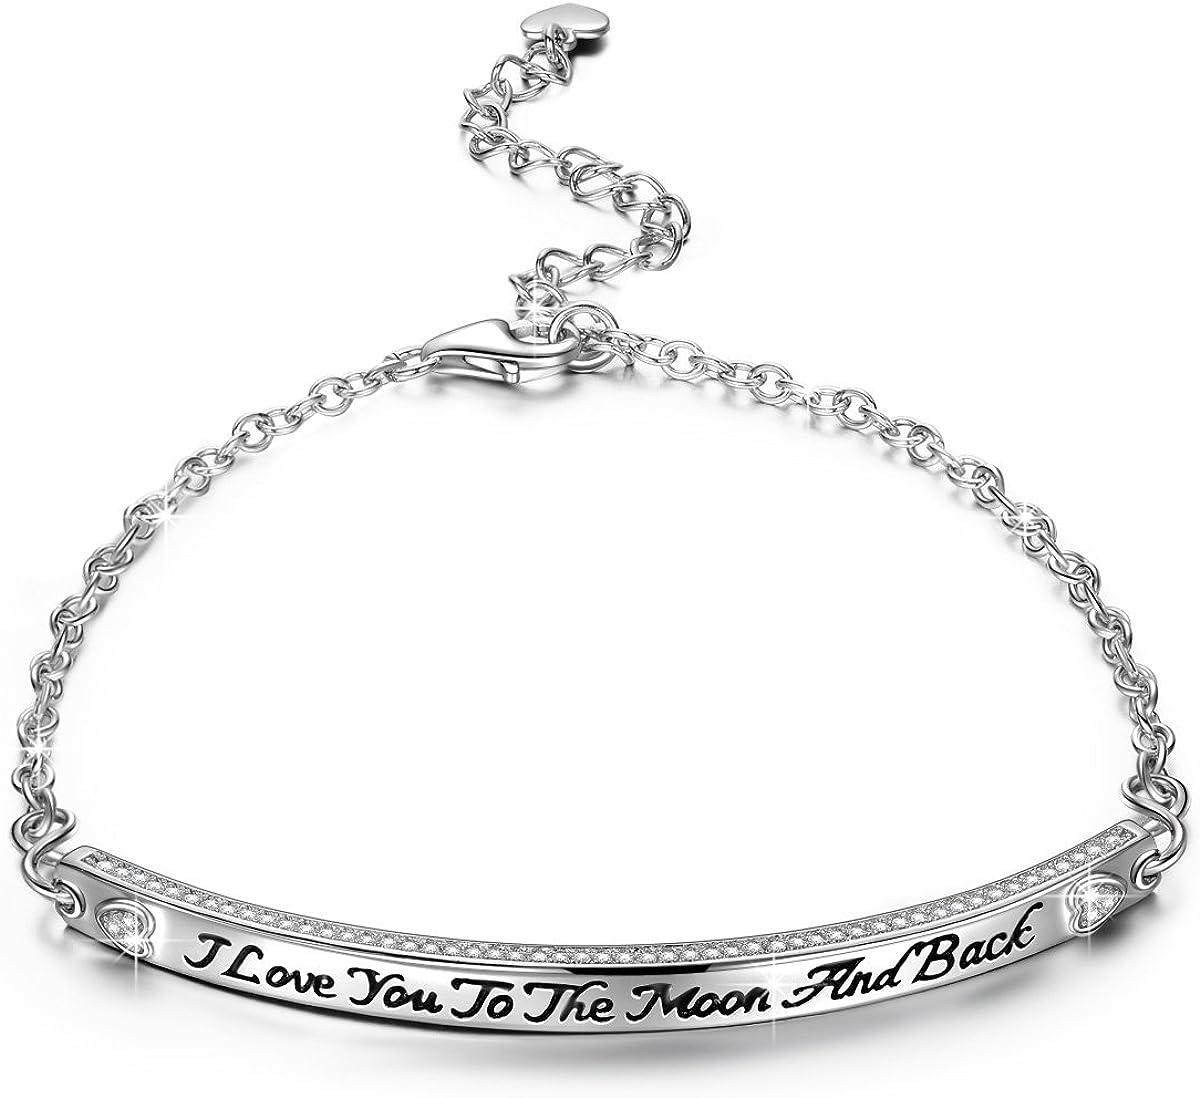 NINASUN Mother's Day Bracelet Gifts Popular popular Silver Adjustab Sterling 925 New item